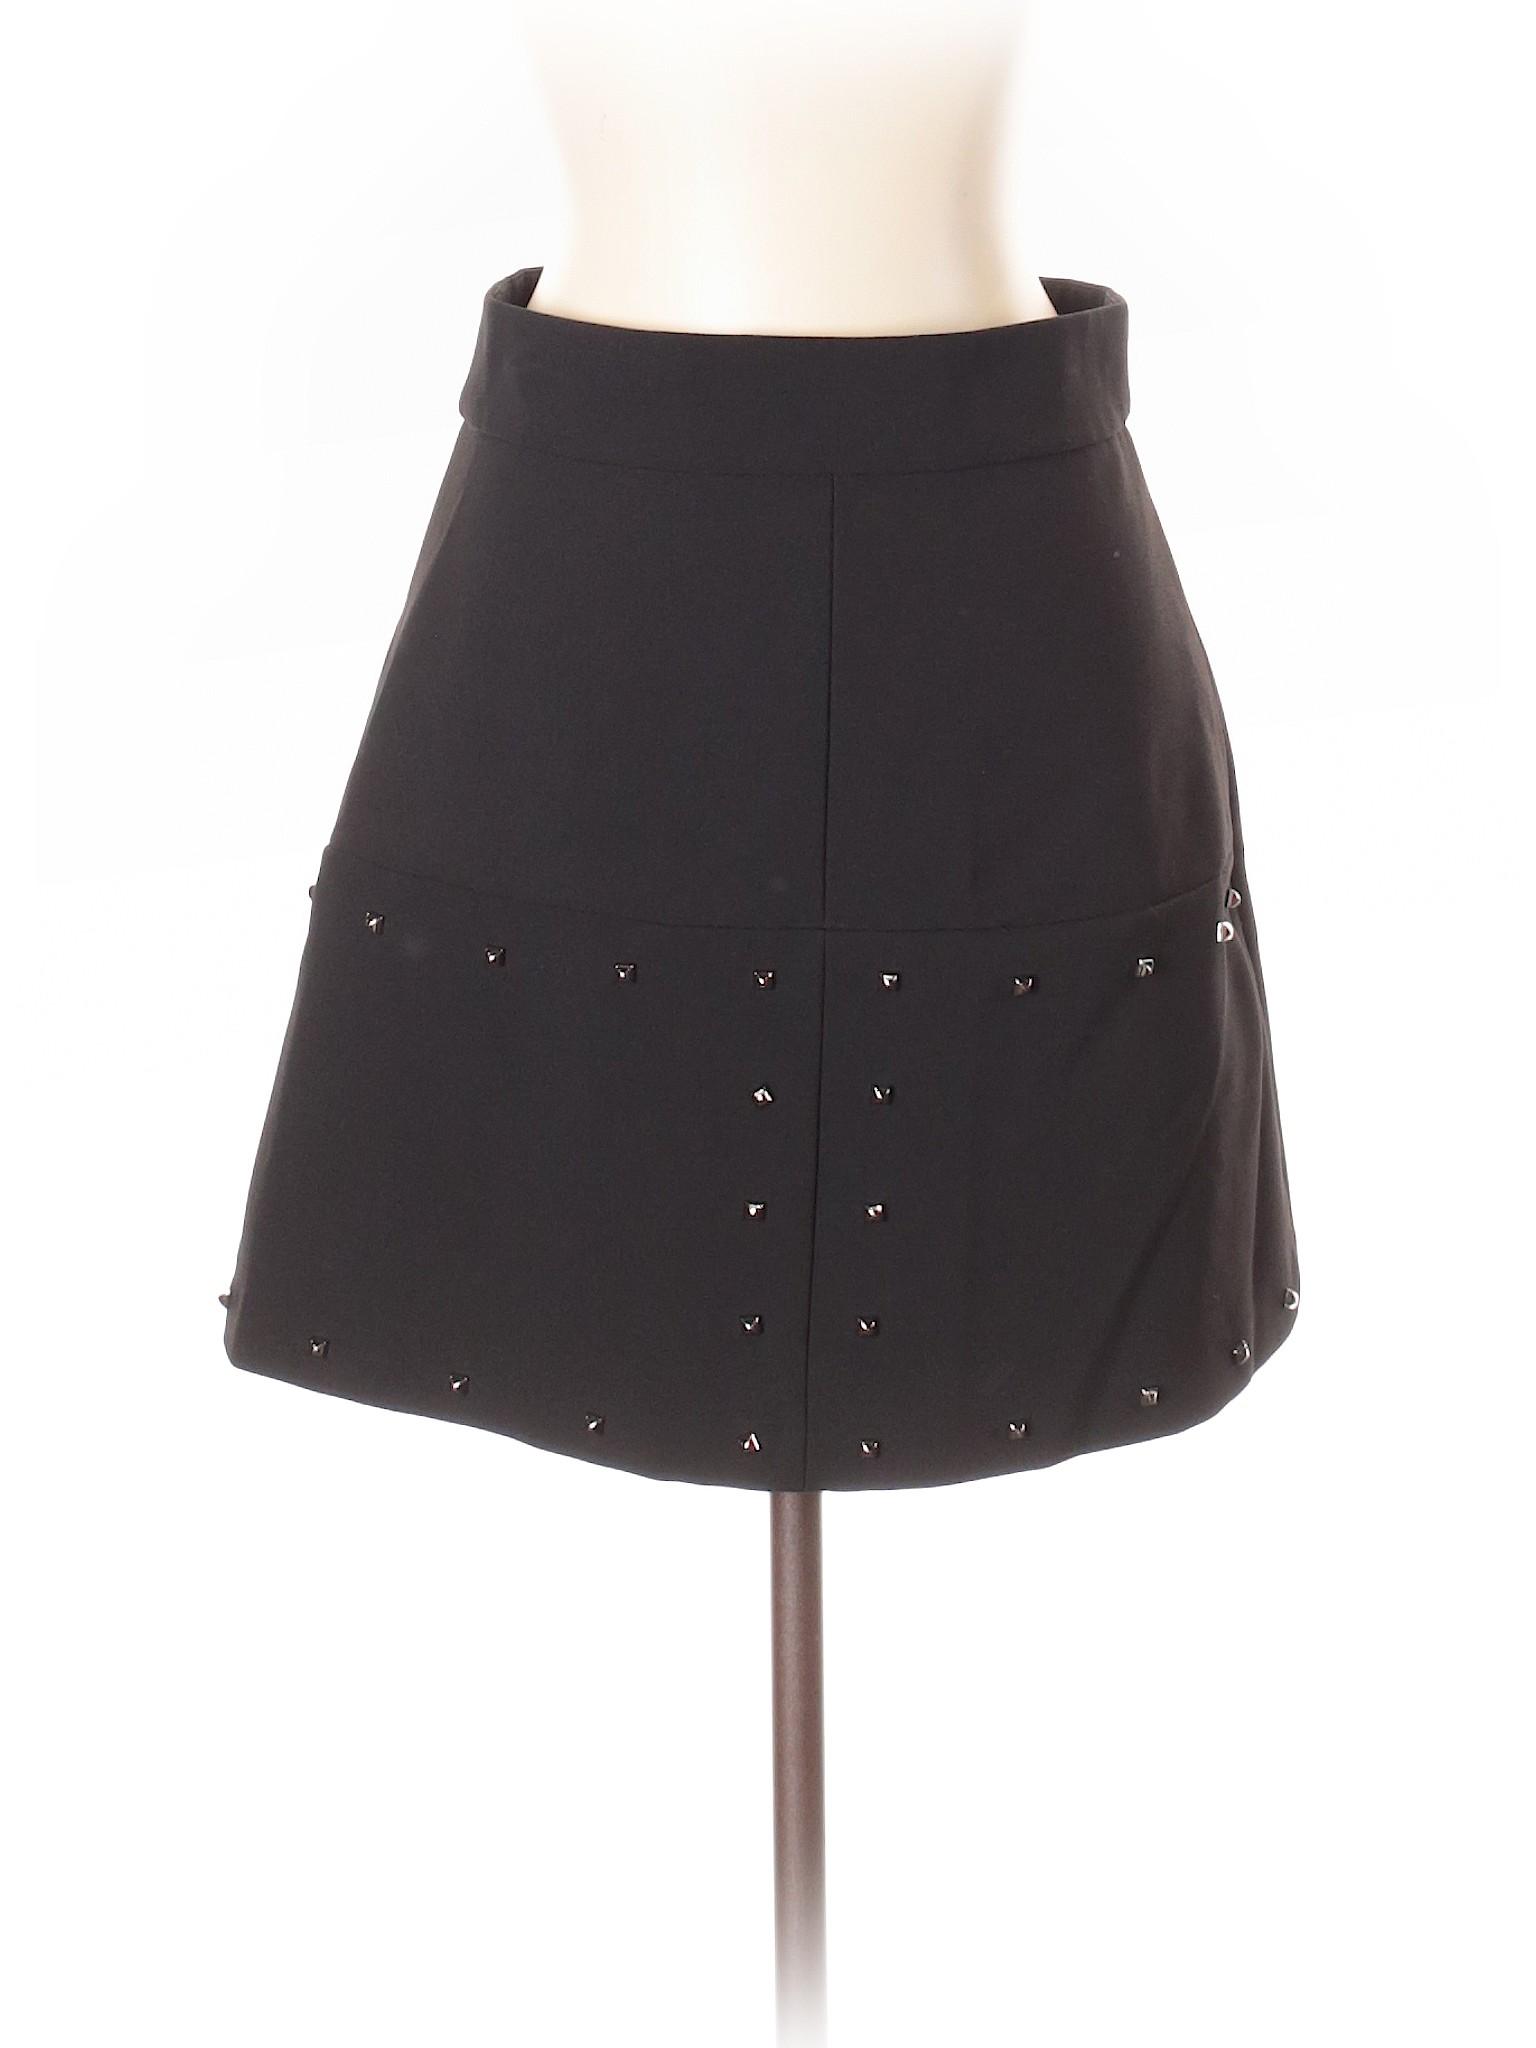 Boutique Skirt Boutique Skirt Casual Skirt Casual Casual Boutique zB7pw